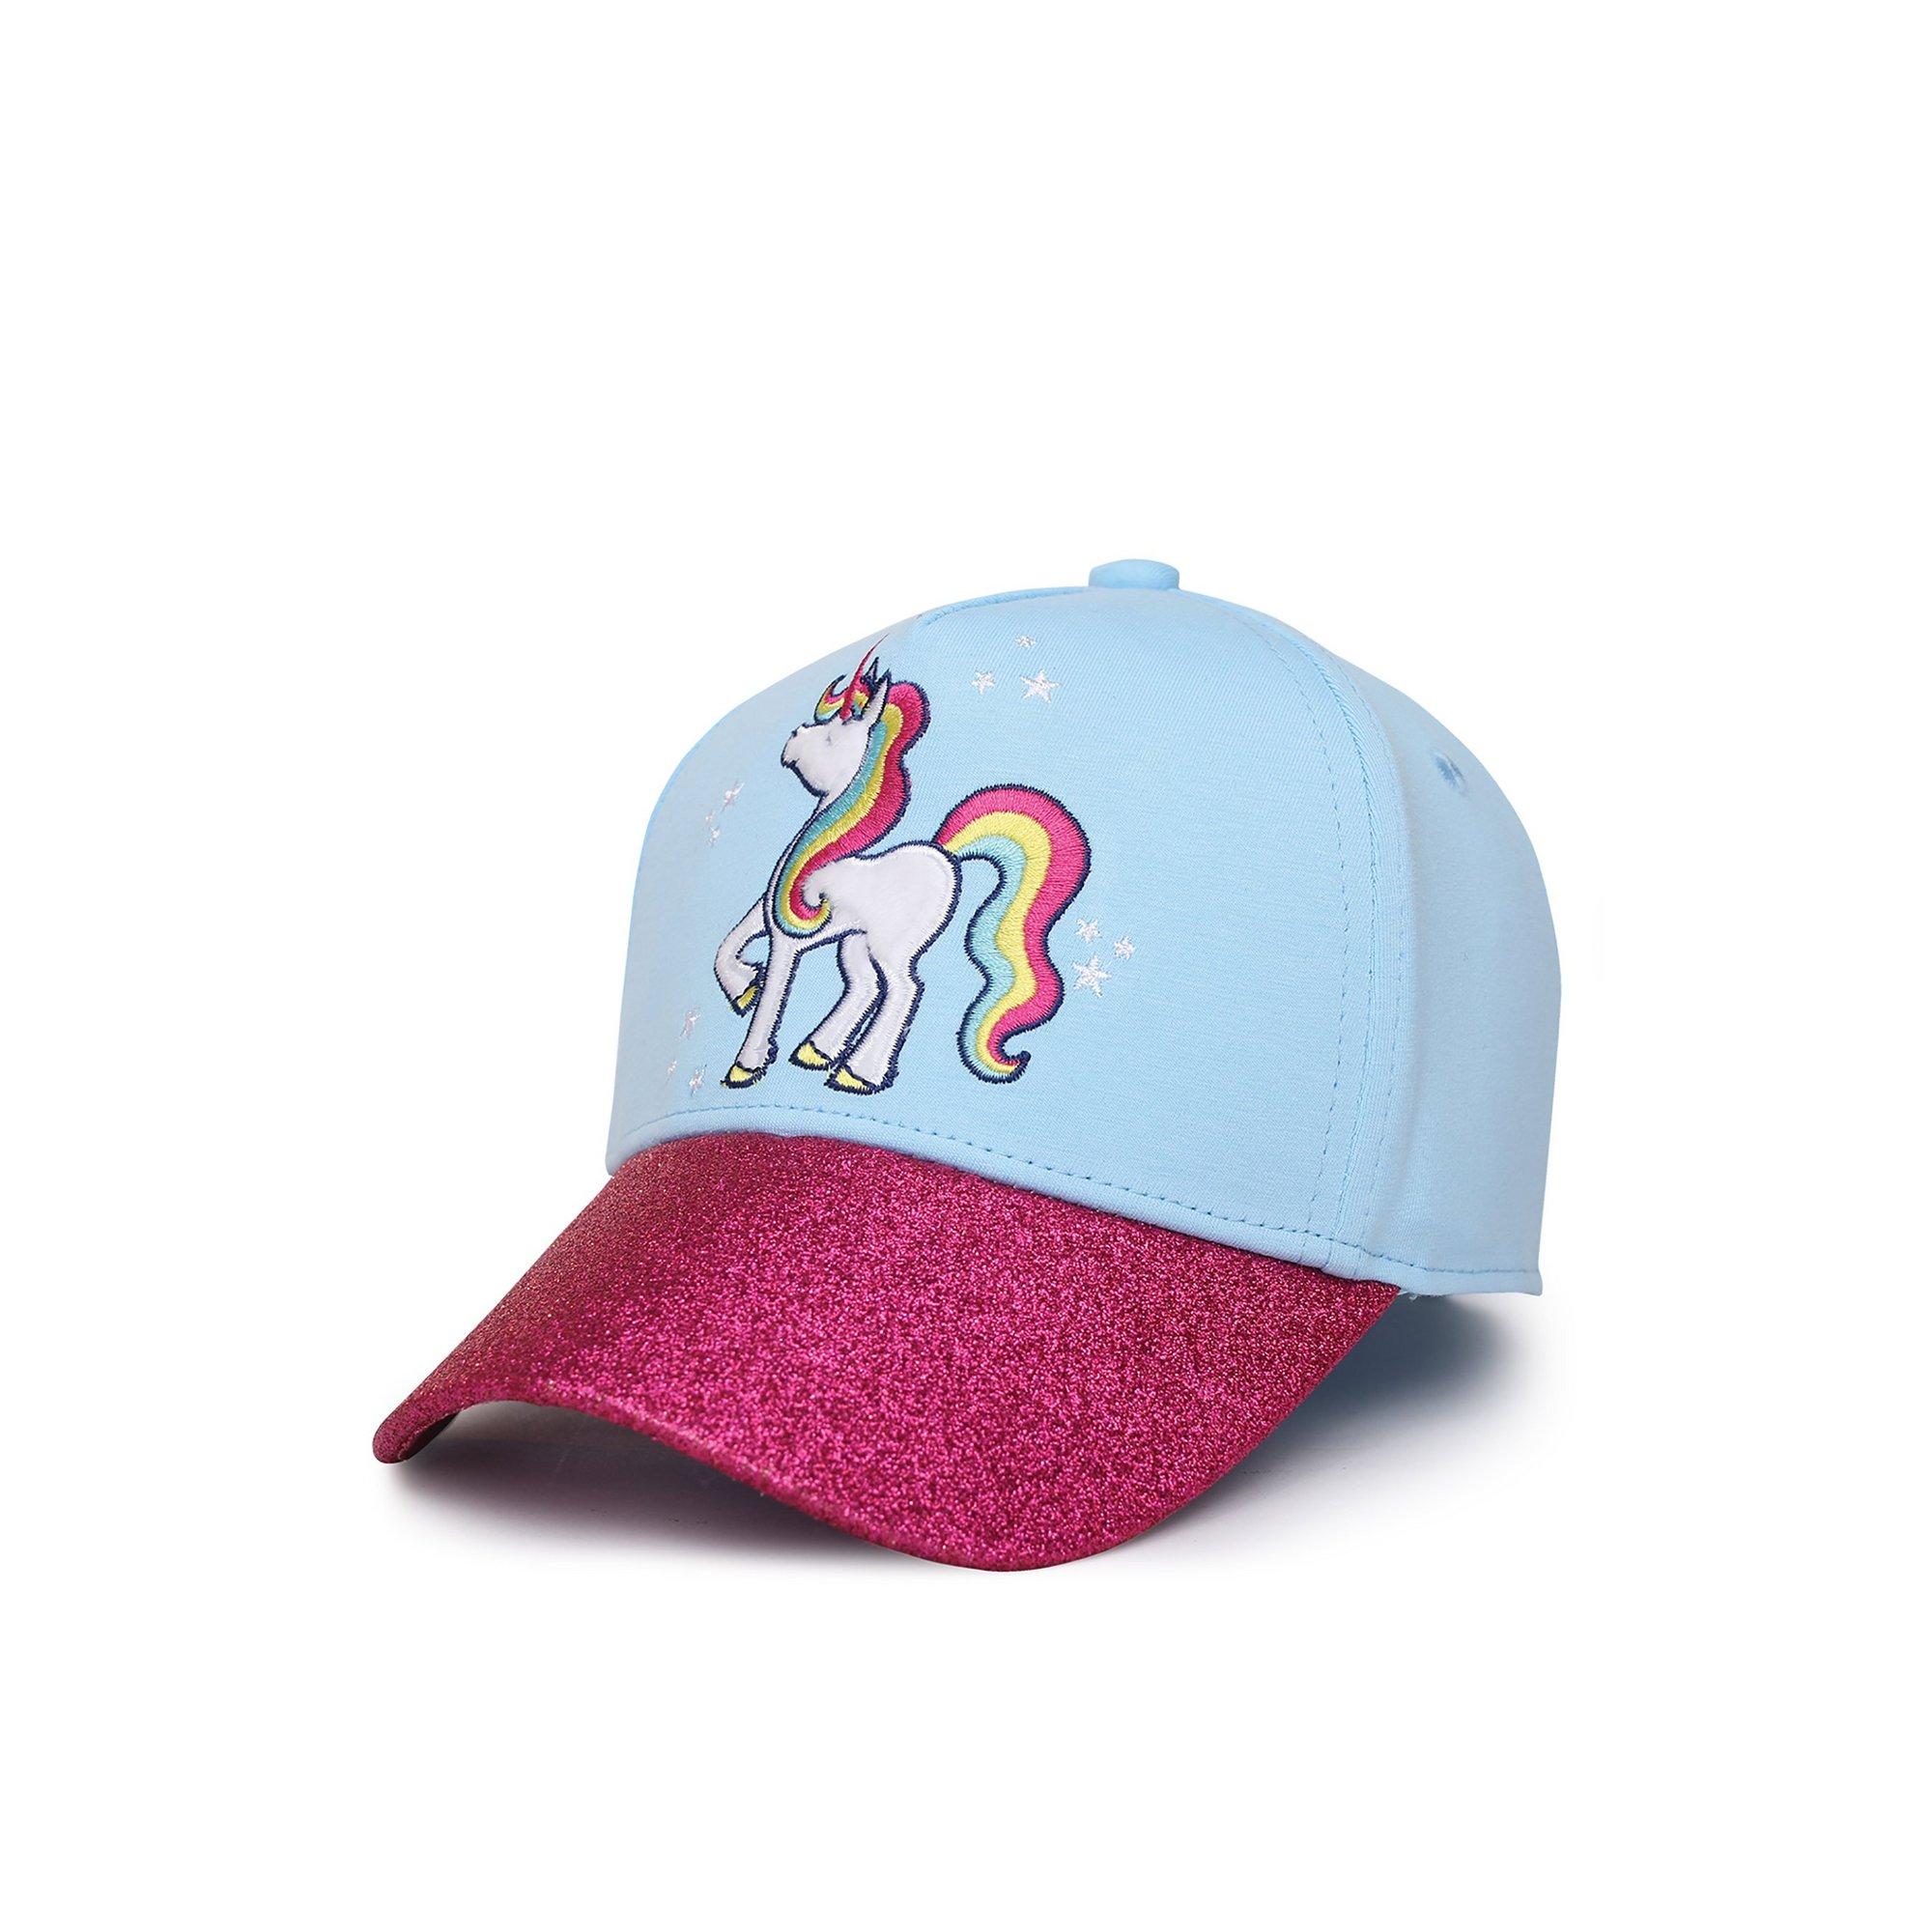 Image of FlapJackKids Ball Cap - Unicorn